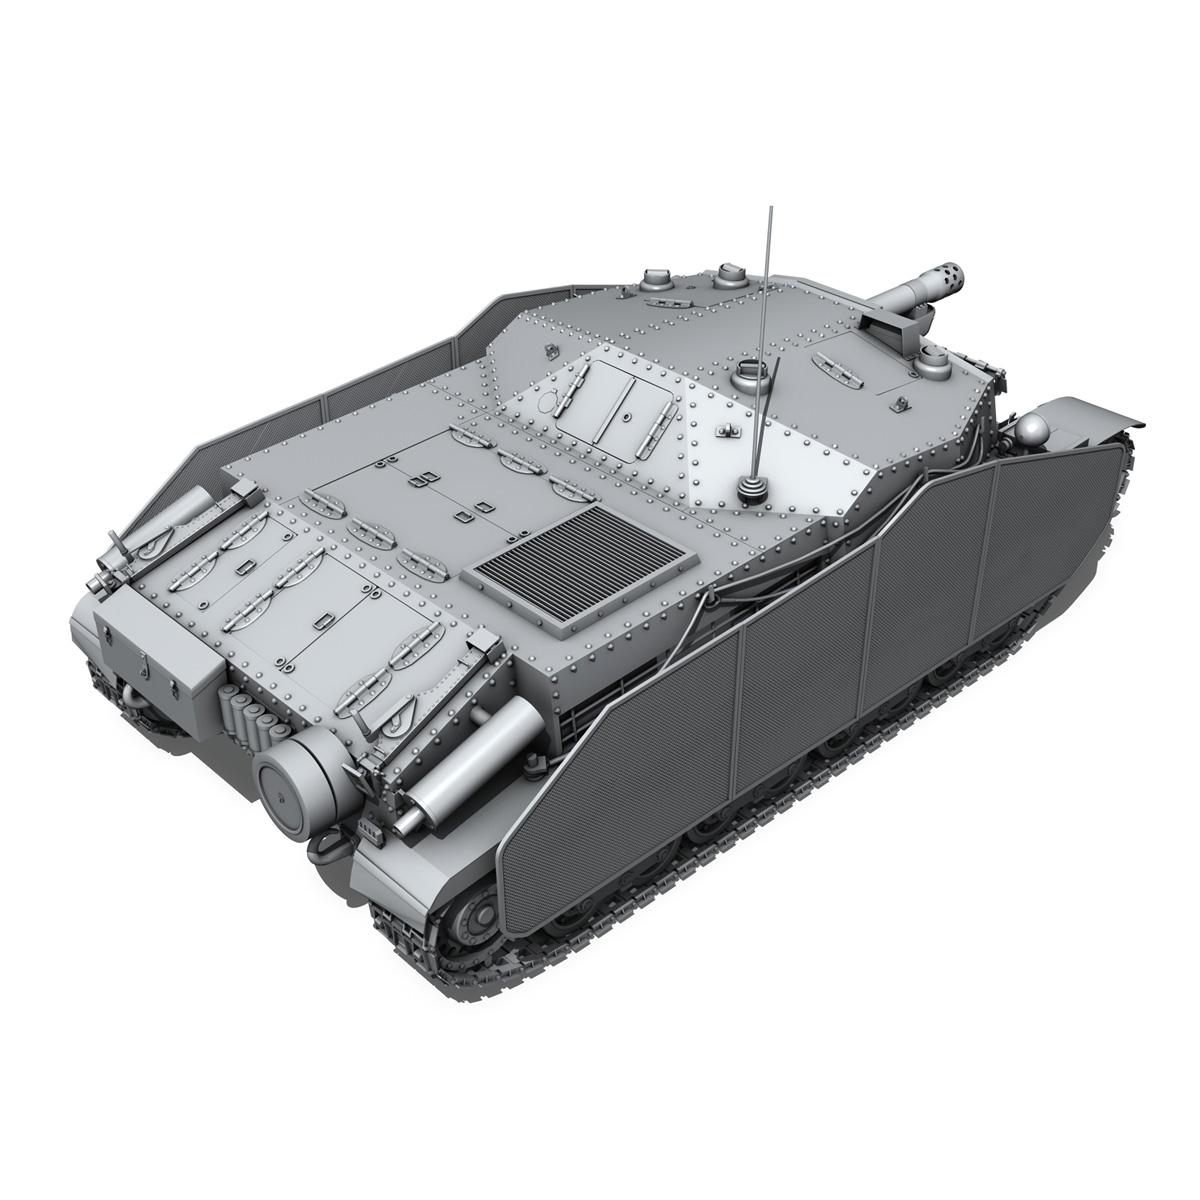 43m zrinyi ii - Macar hücum silahı 3d model 3ds fbx c4d lwo obj 251634